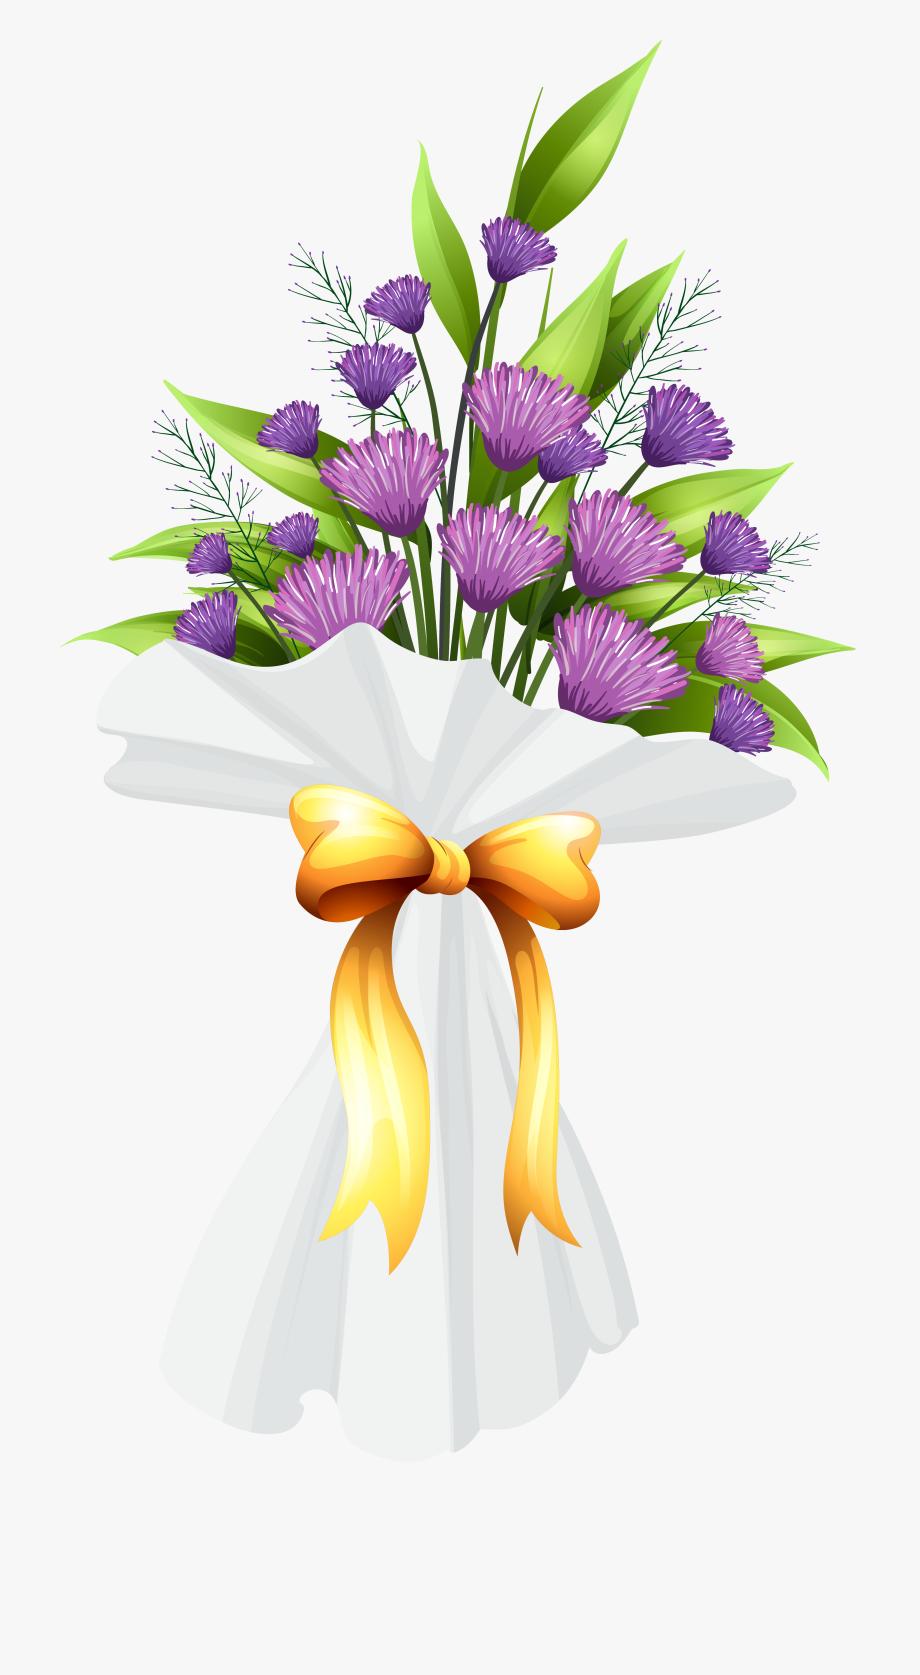 Sympathy Clipart Flower Bunch.